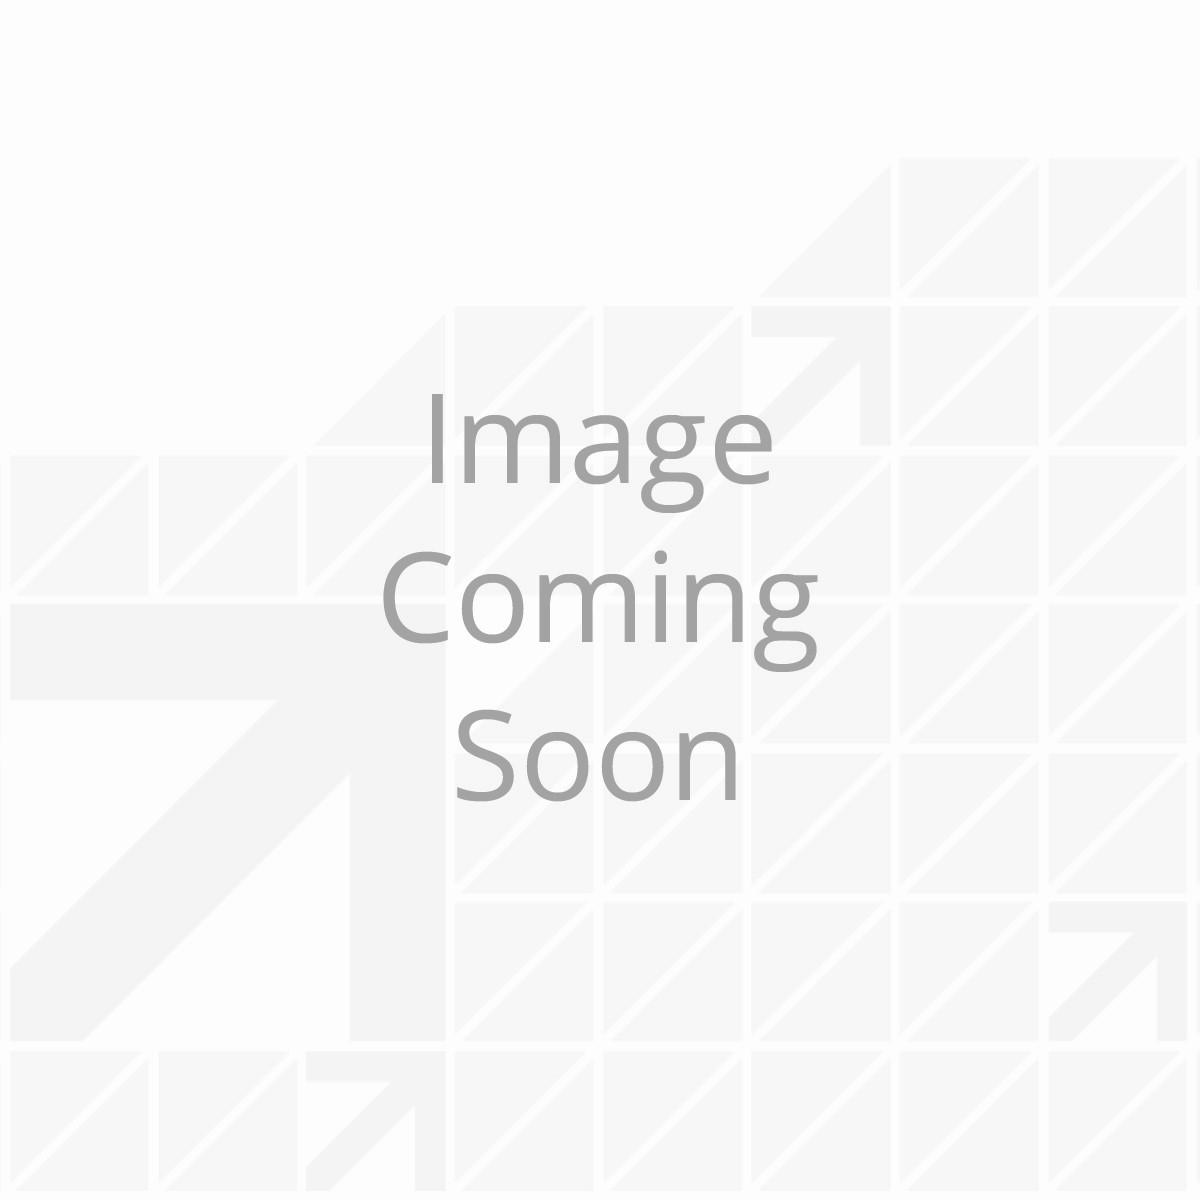 1 Mesa also 370812515911 as well Extention Pole Roof Window besides Rv Door Dimensions Medium Size Of Garage Door Images House Ideas Standard Double Garage Door Sizes Rv Storage Door Height Rv Garage Door Height also Parts Of A Door Latch Rv Cargo Door Latch Parts. on rv entry doors